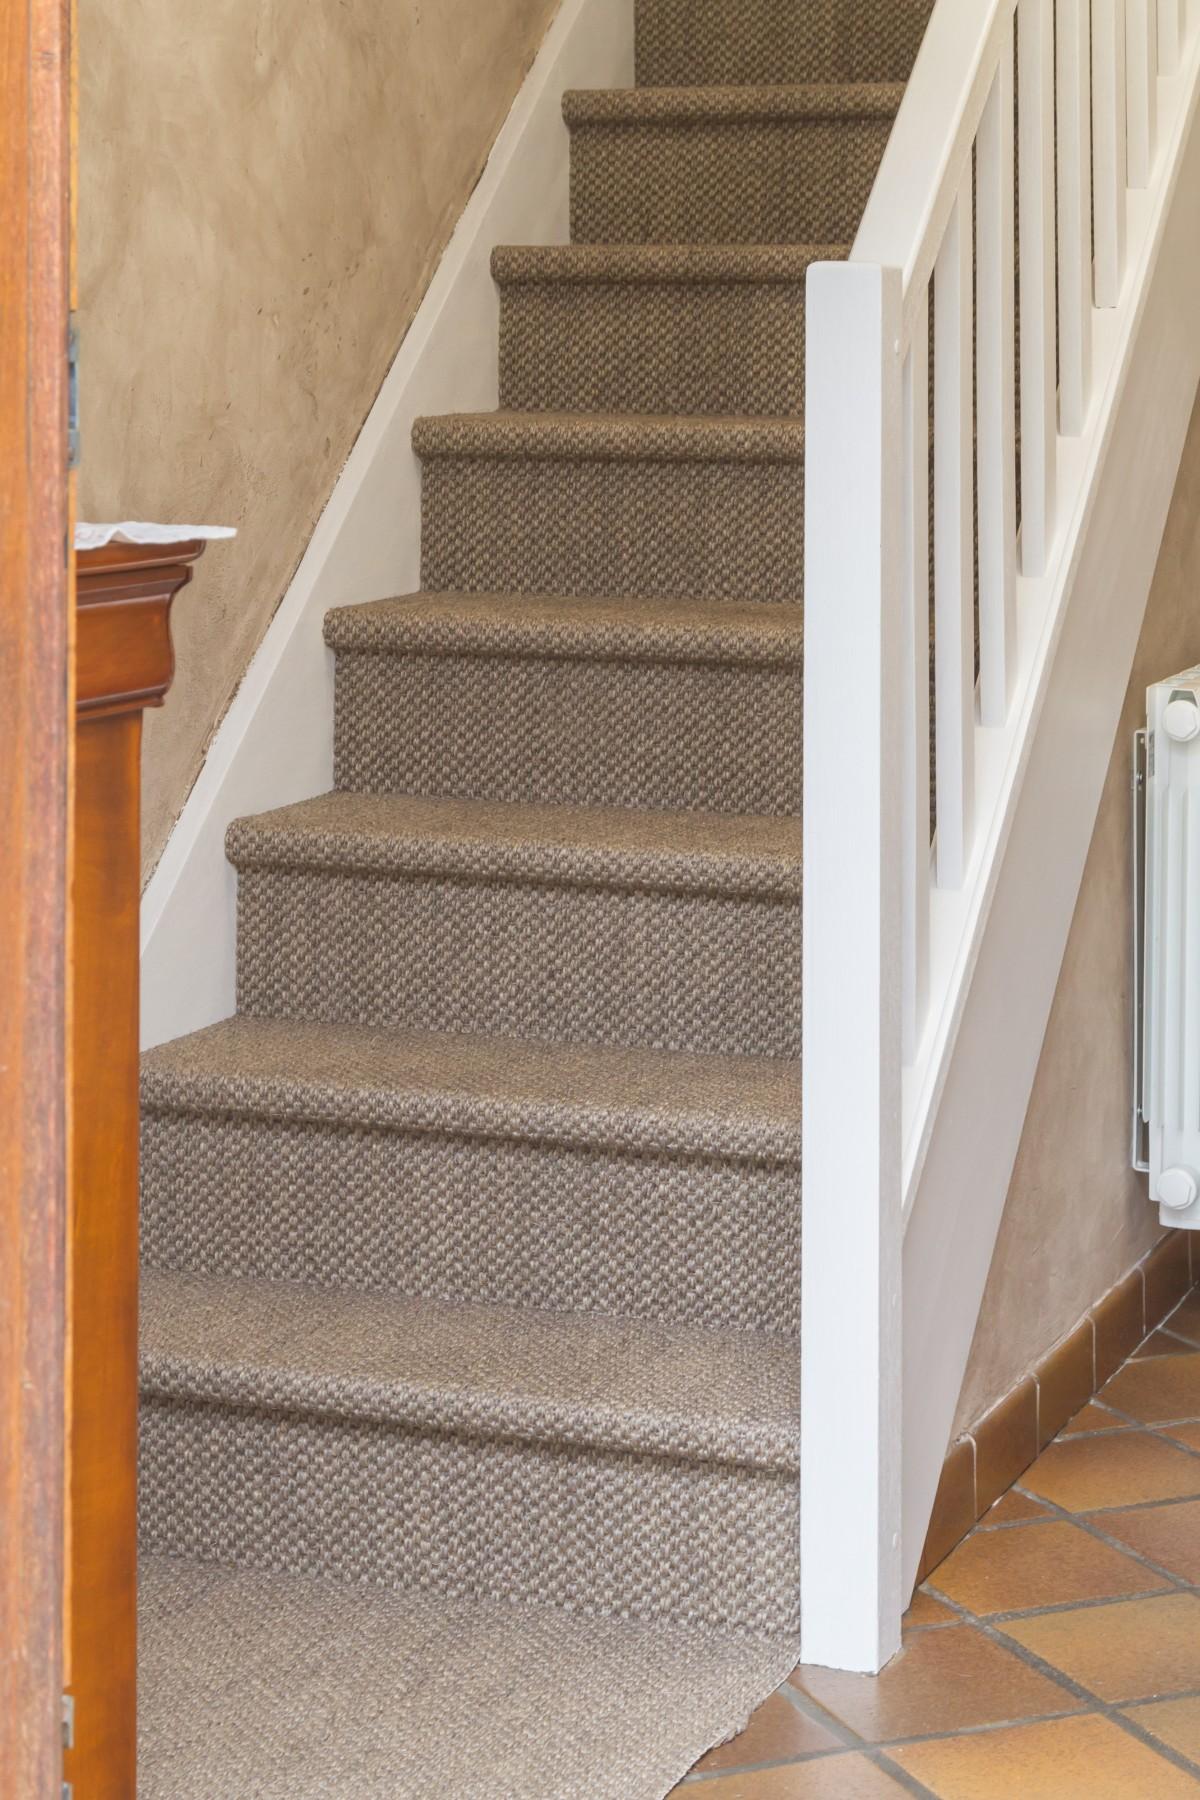 Carrousel_renovation-escalier-sol-naturel_1